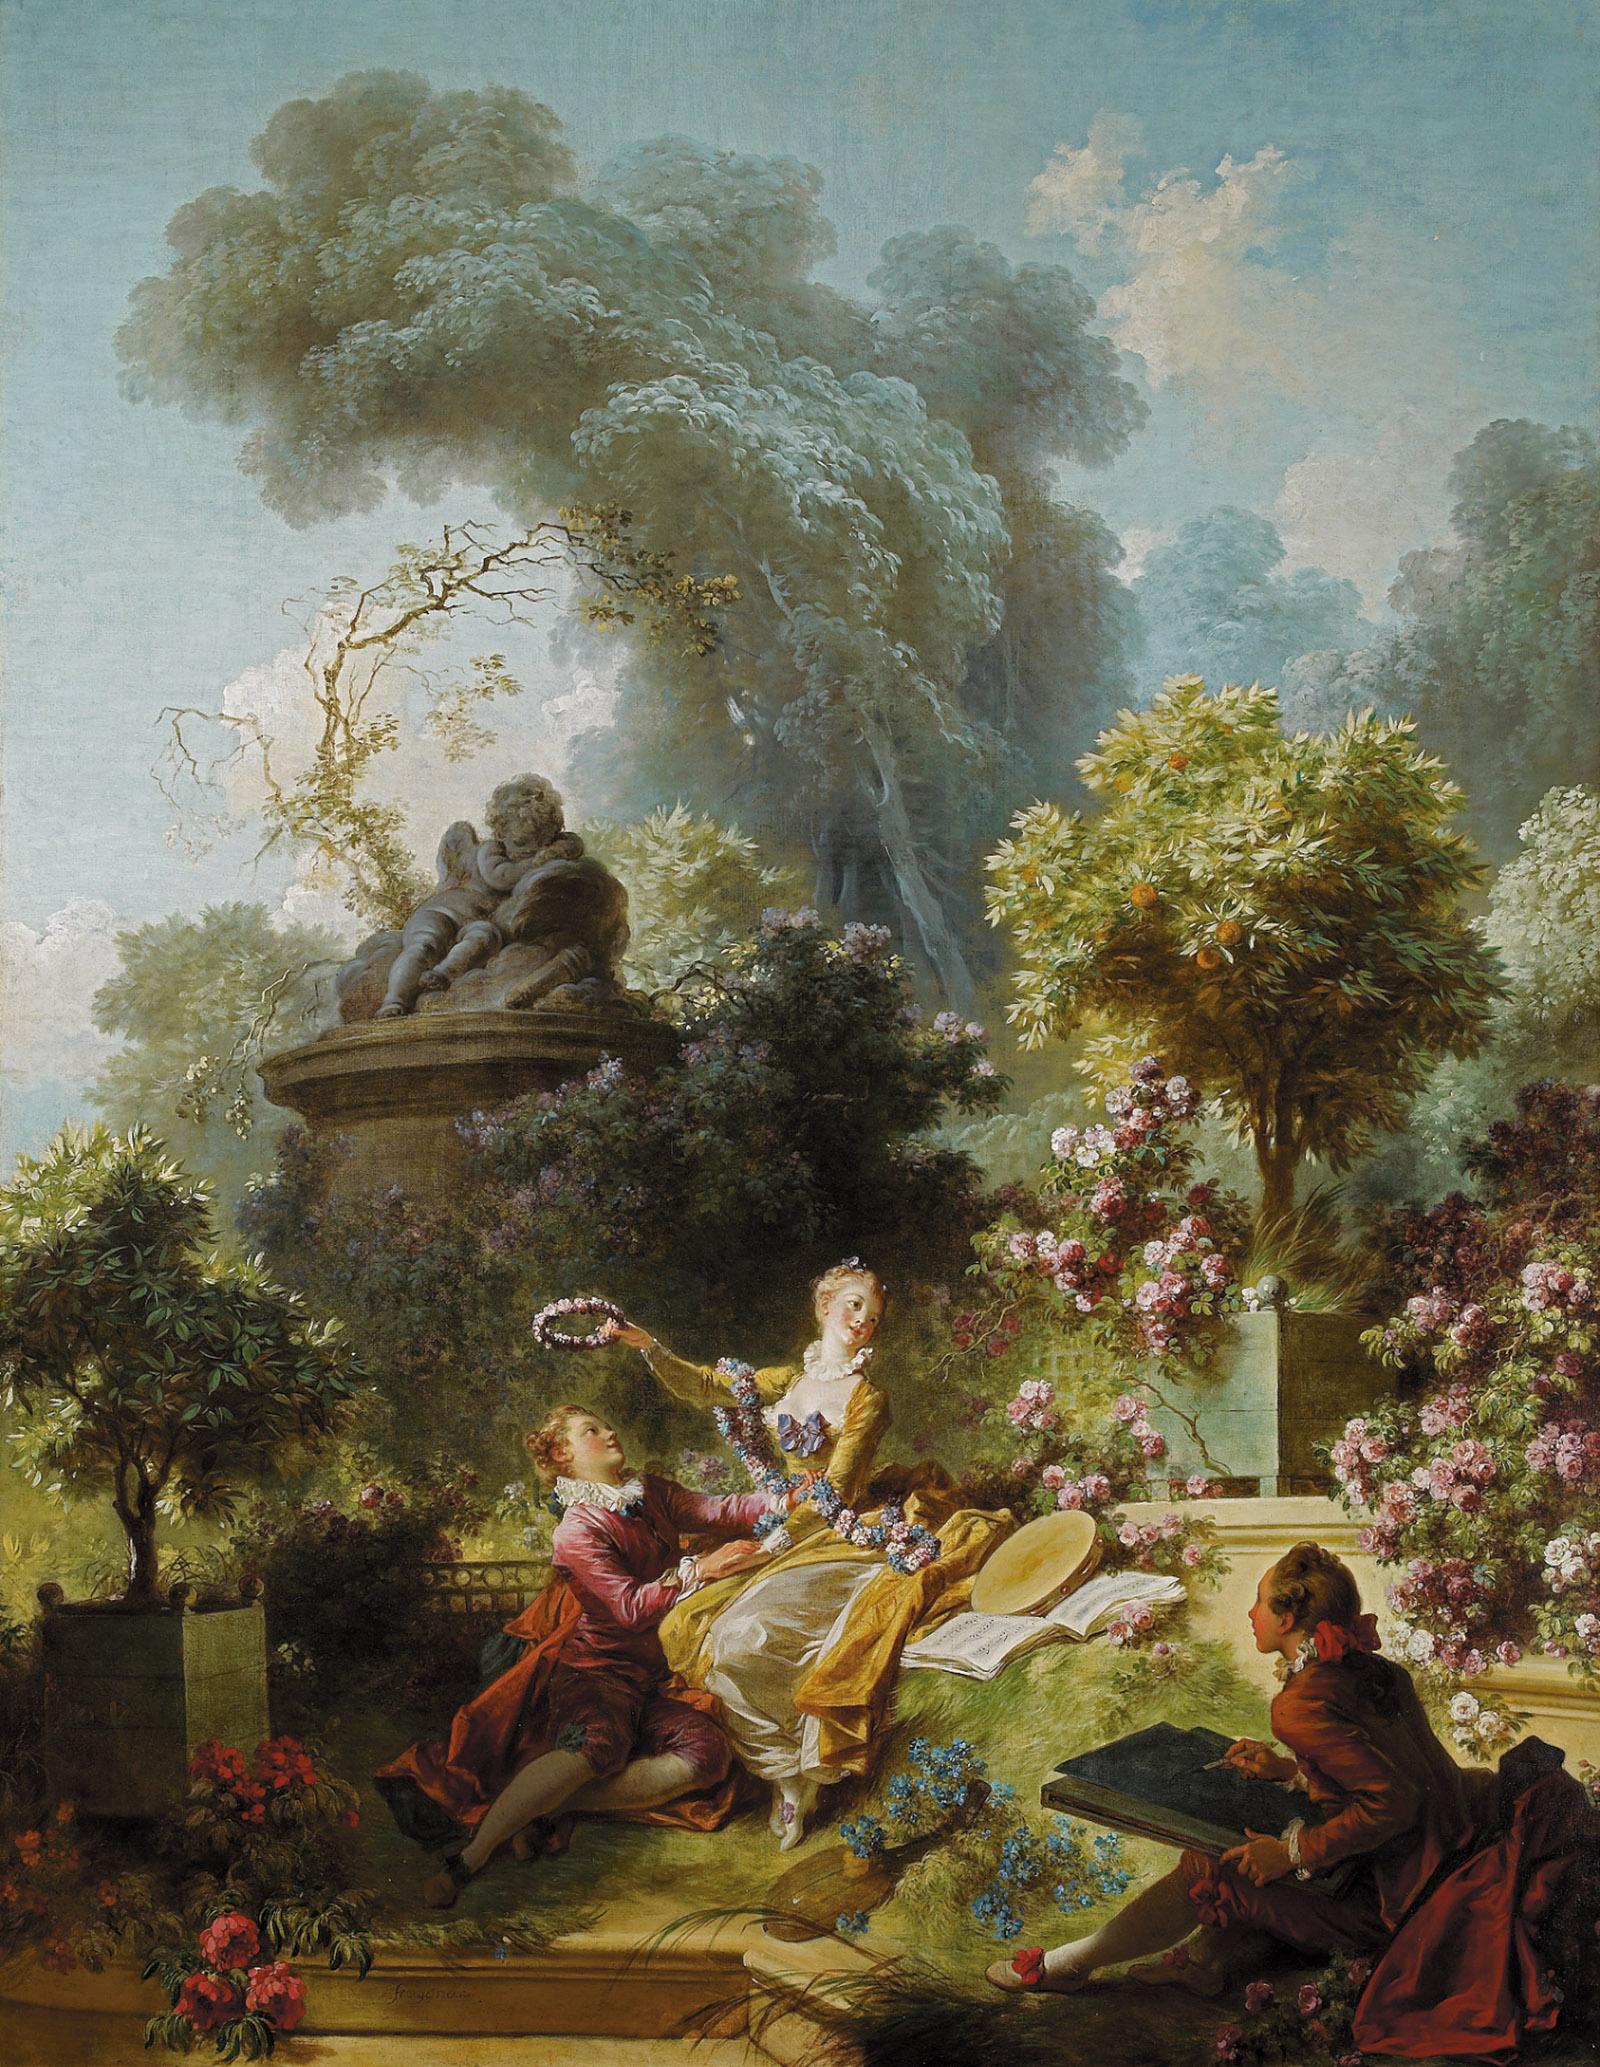 Jean-Honoré Fragonard: The Progress of Love: The Lover Crowned, 1771–1772